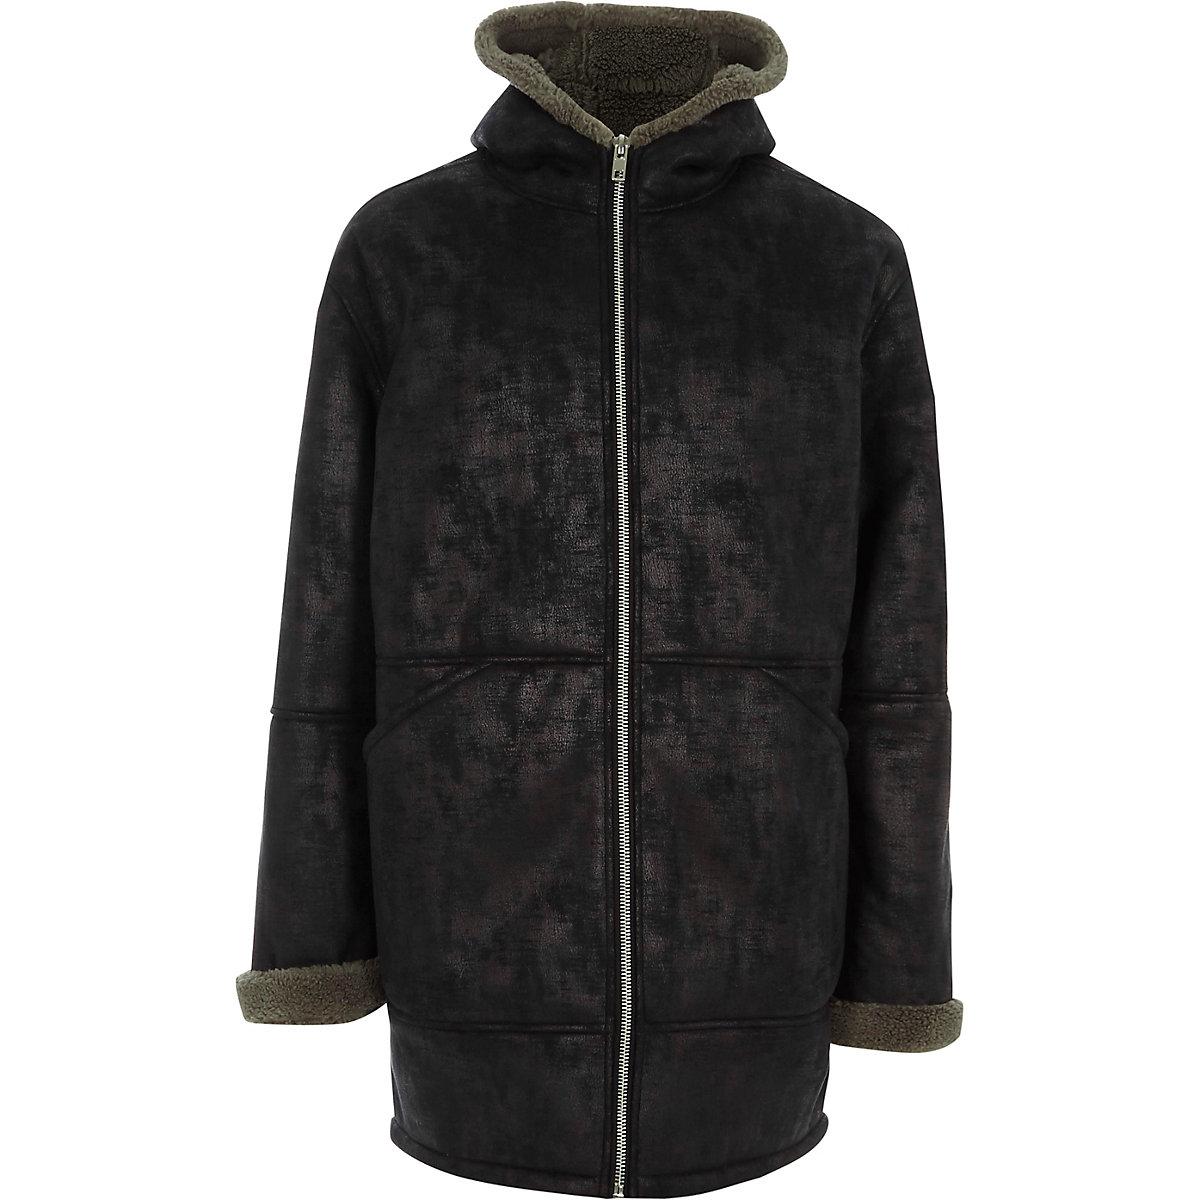 Black faux shearling oversized hooded jacket